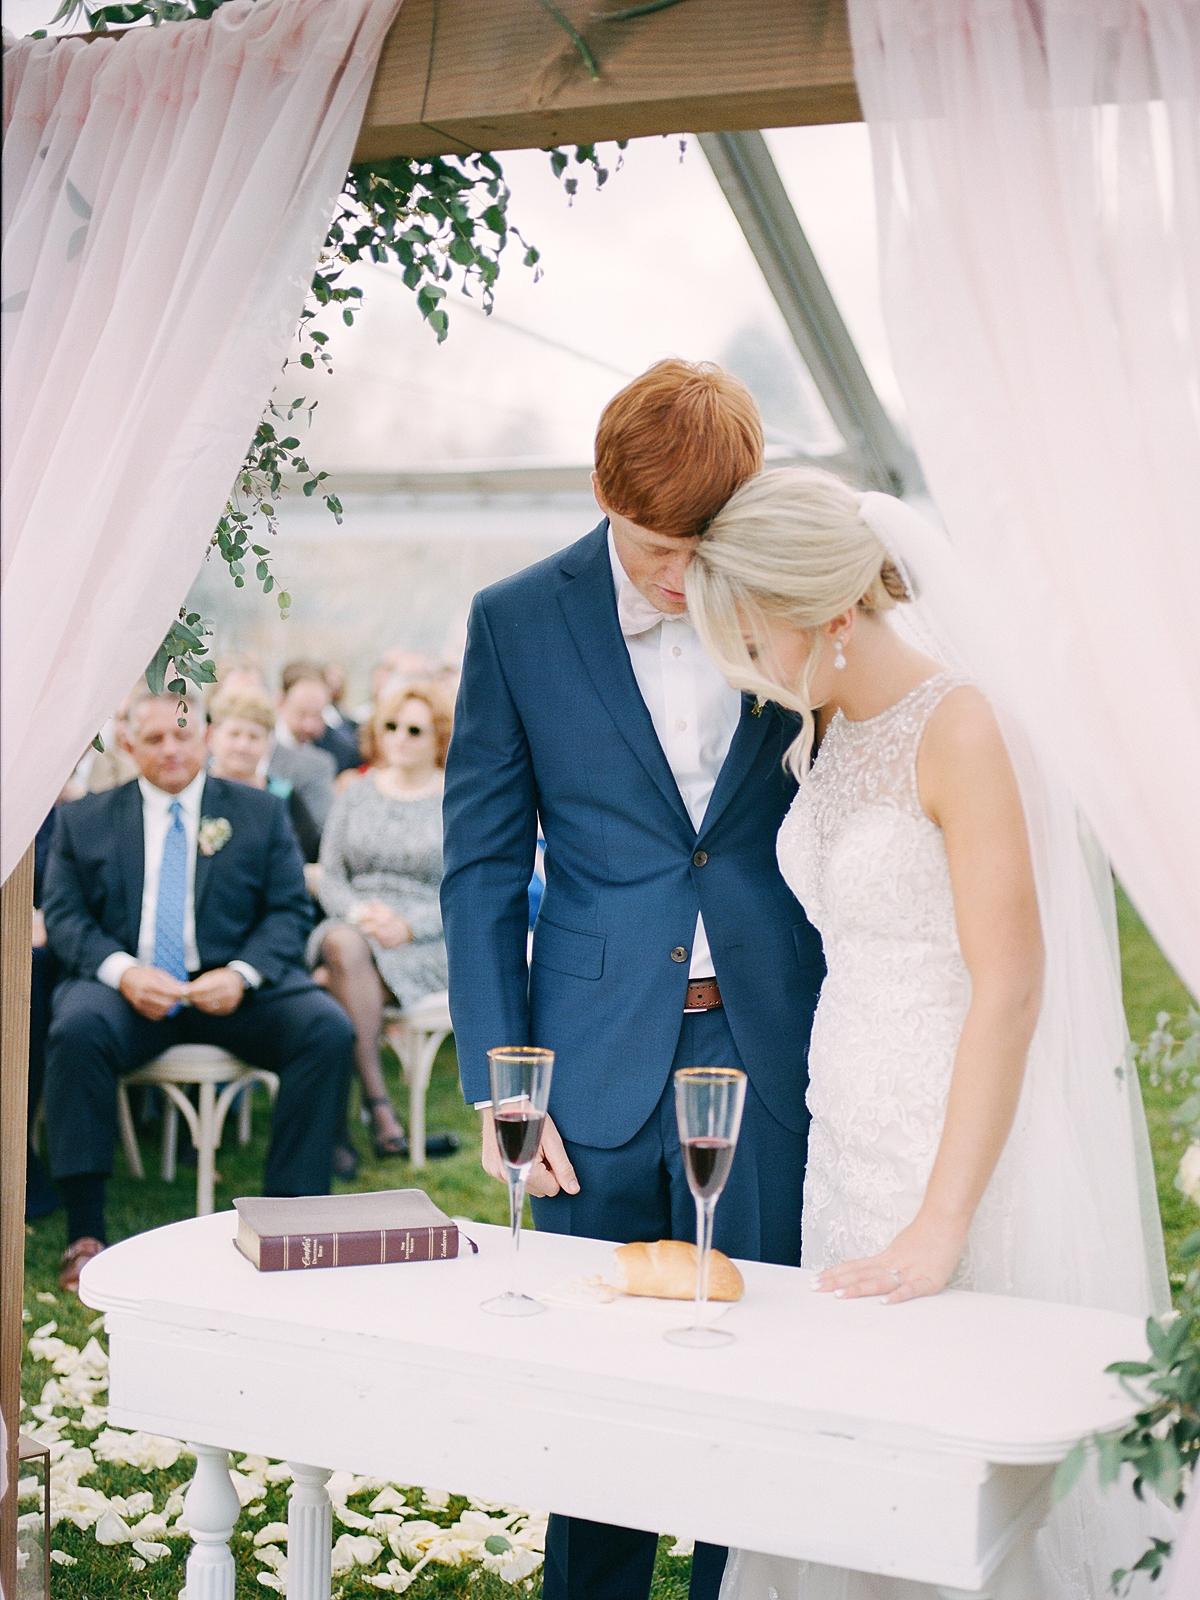 WillowBridgeBoiseWeddingPhotographer_0137.jpgIra and Lucy Wedding Planner, Boise Wedding Planner, Boise Photography, Brie Thomason Photography, Willowbridge Wedding